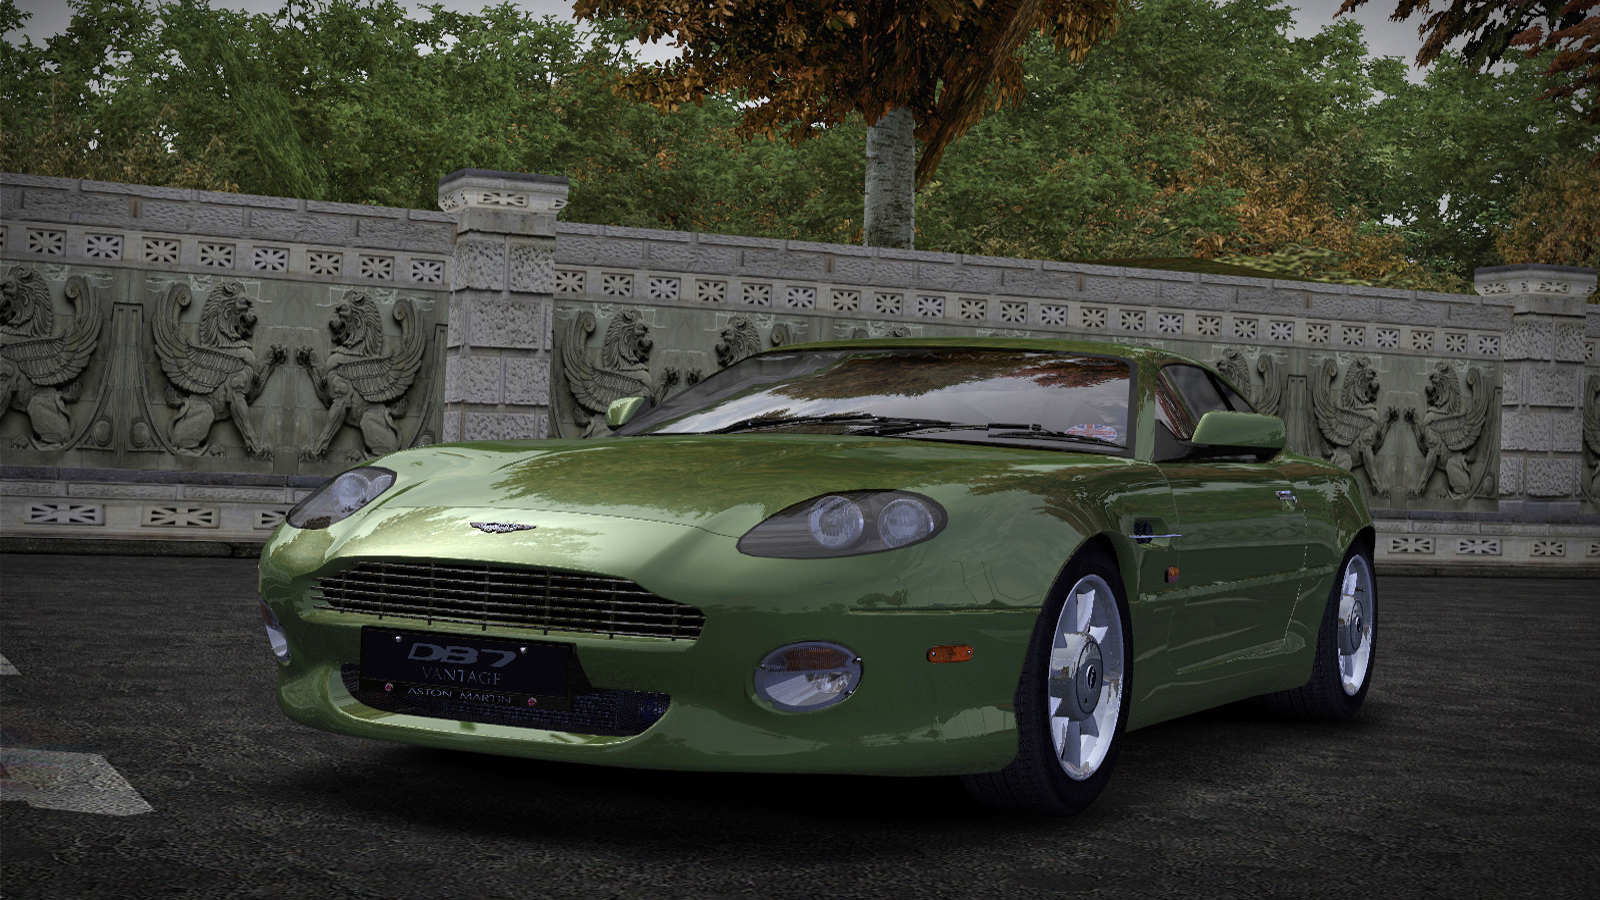 Speed 2020-01-05 19-18-40-725.jpg - Need for Speed: Most Wanted (2005) Aston Martin DB7 Vantage, Автомобиль